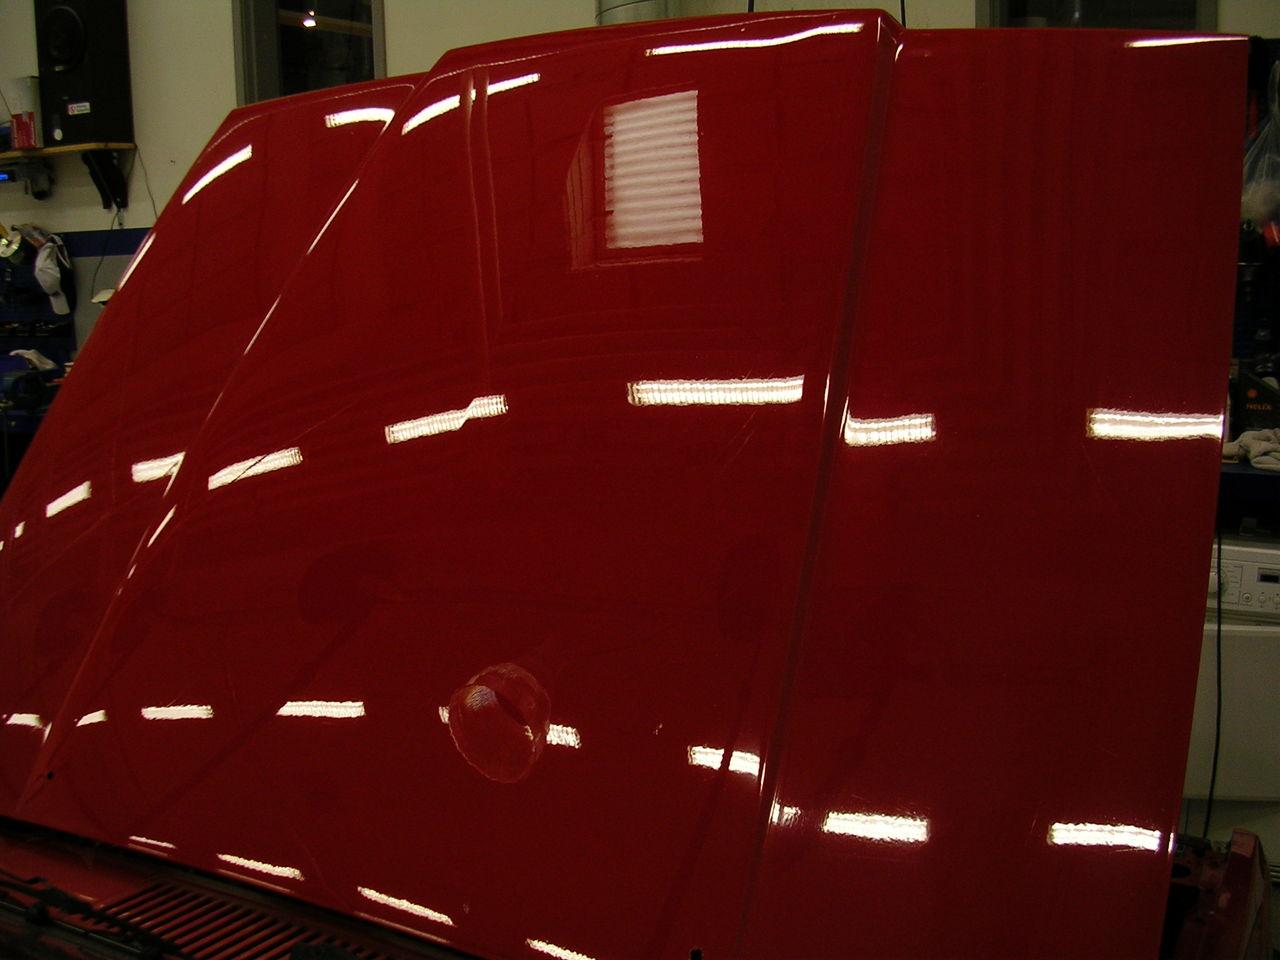 www1.garaget.org/gallery/archive/68807/large/409277_1bqfs0.jpg